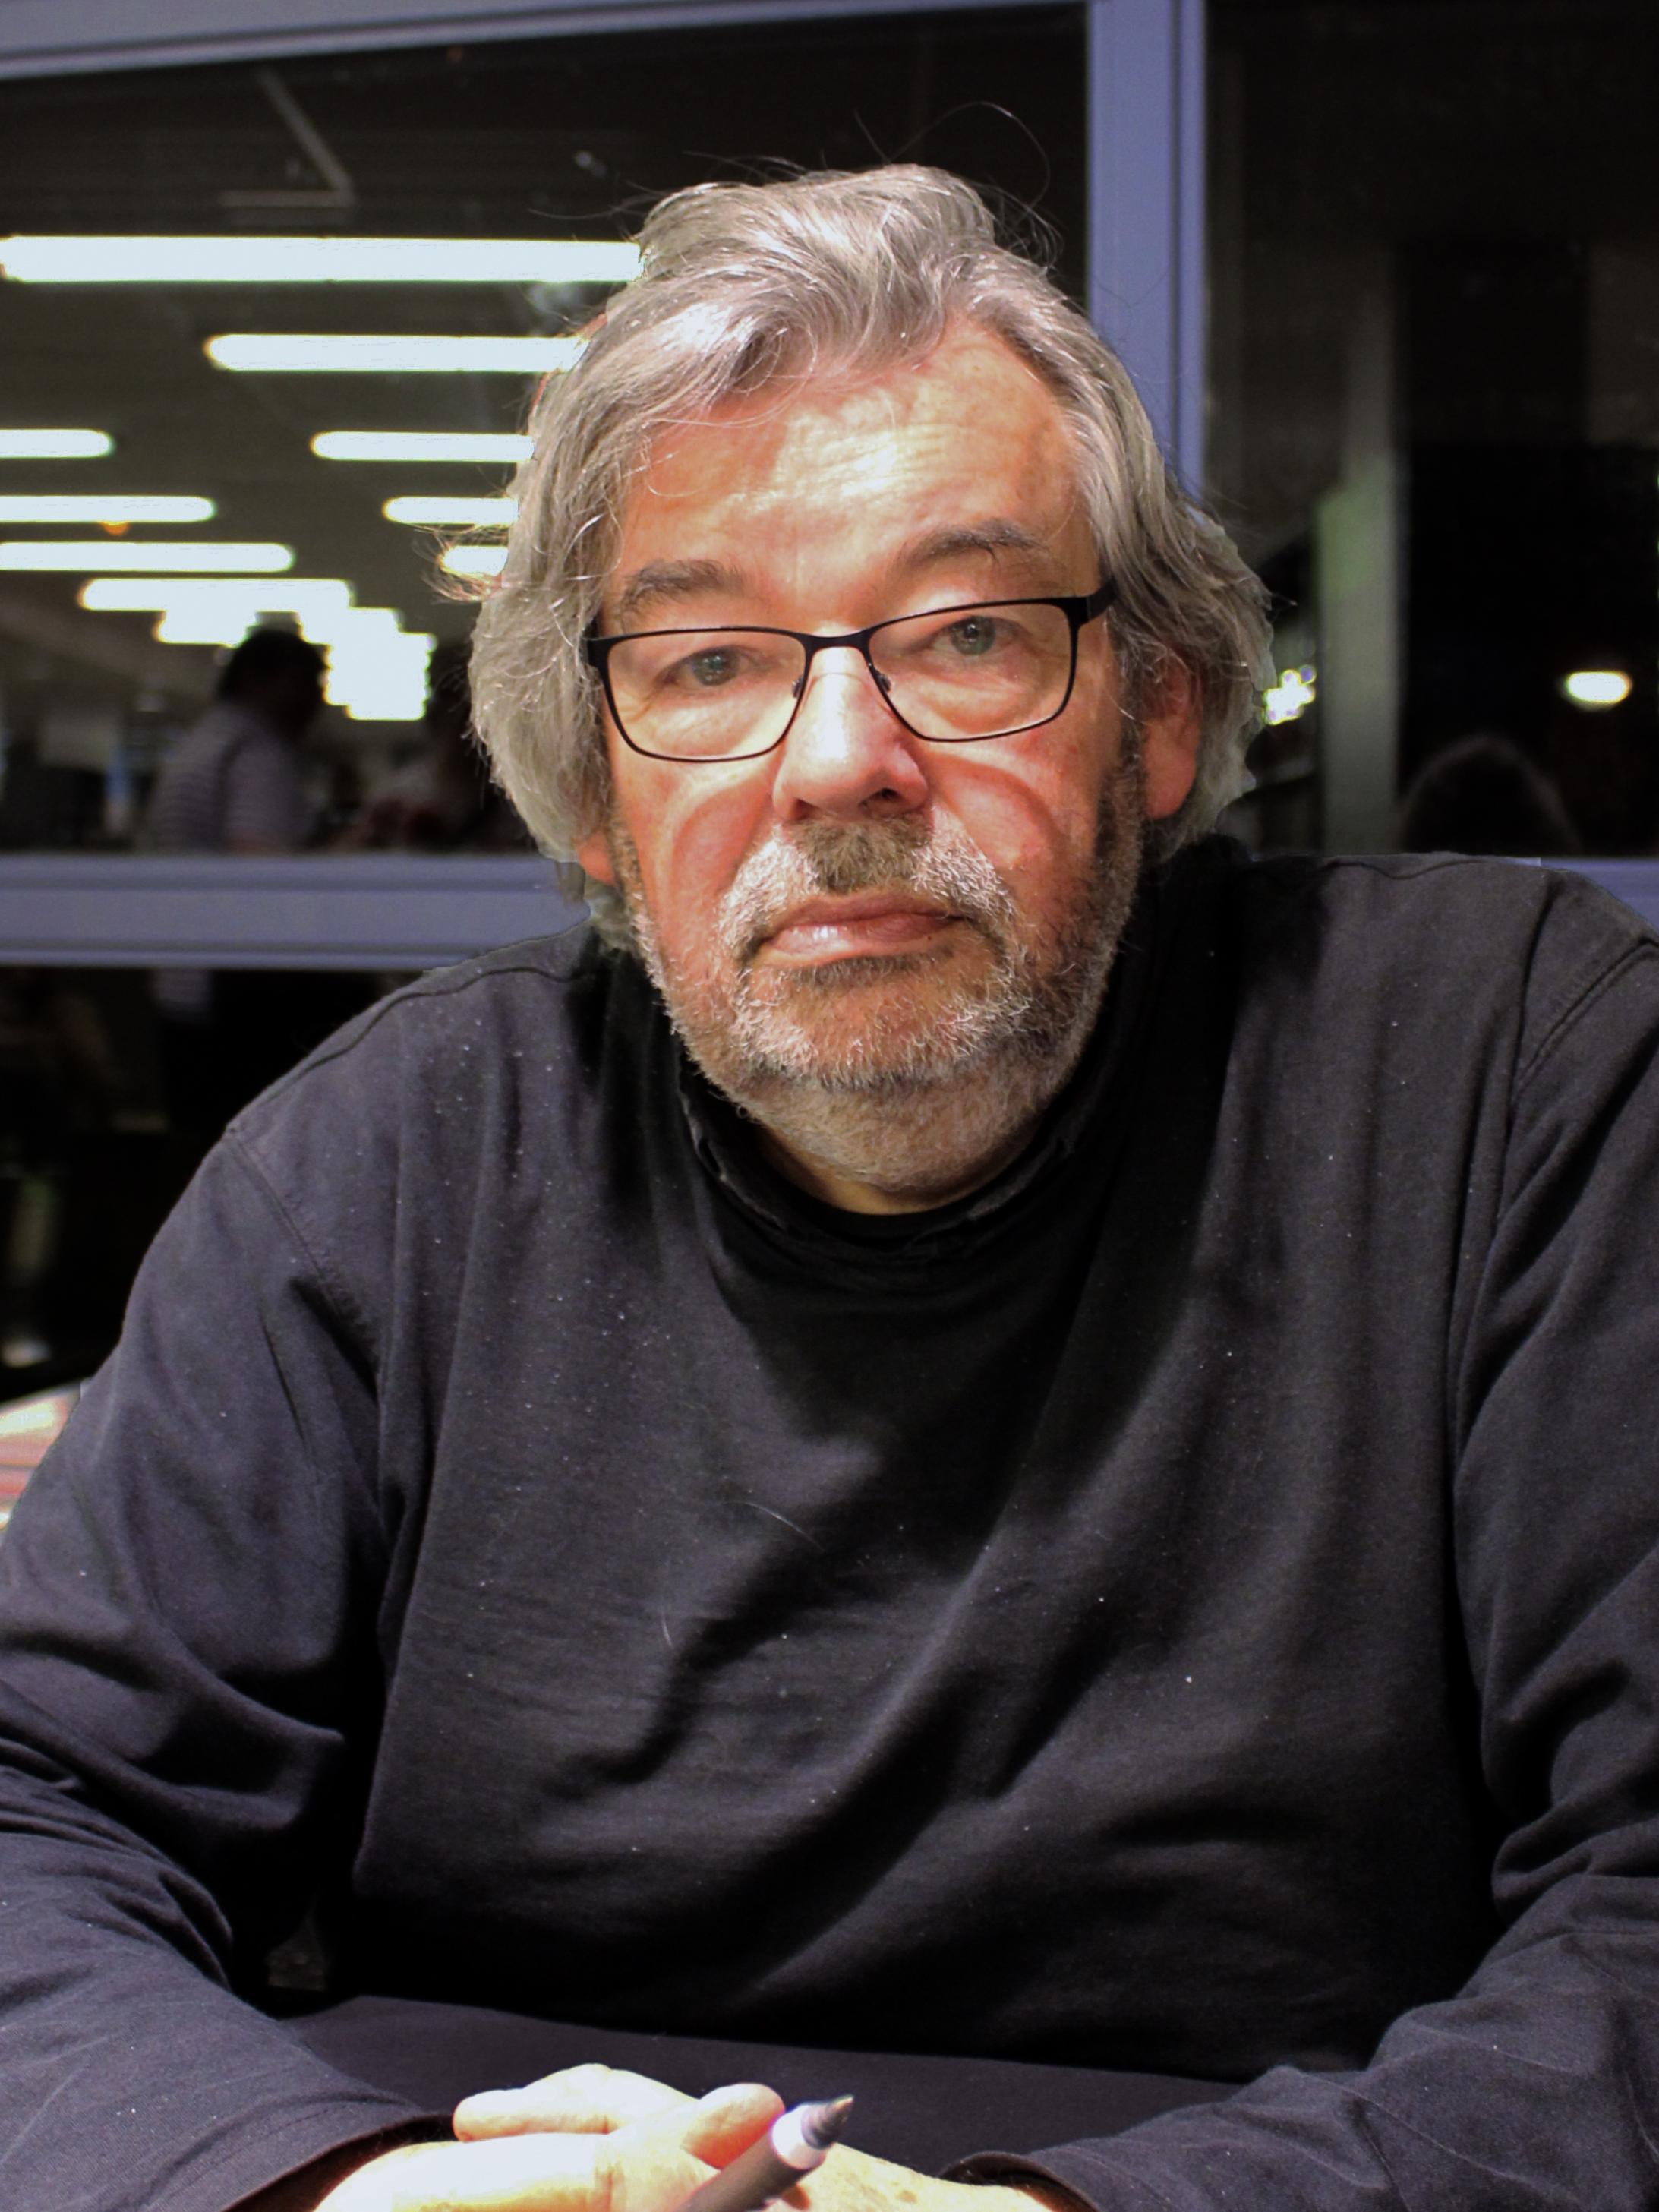 File Maarten Van Rossem 2013 Cropped Jpg Wikimedia Commons